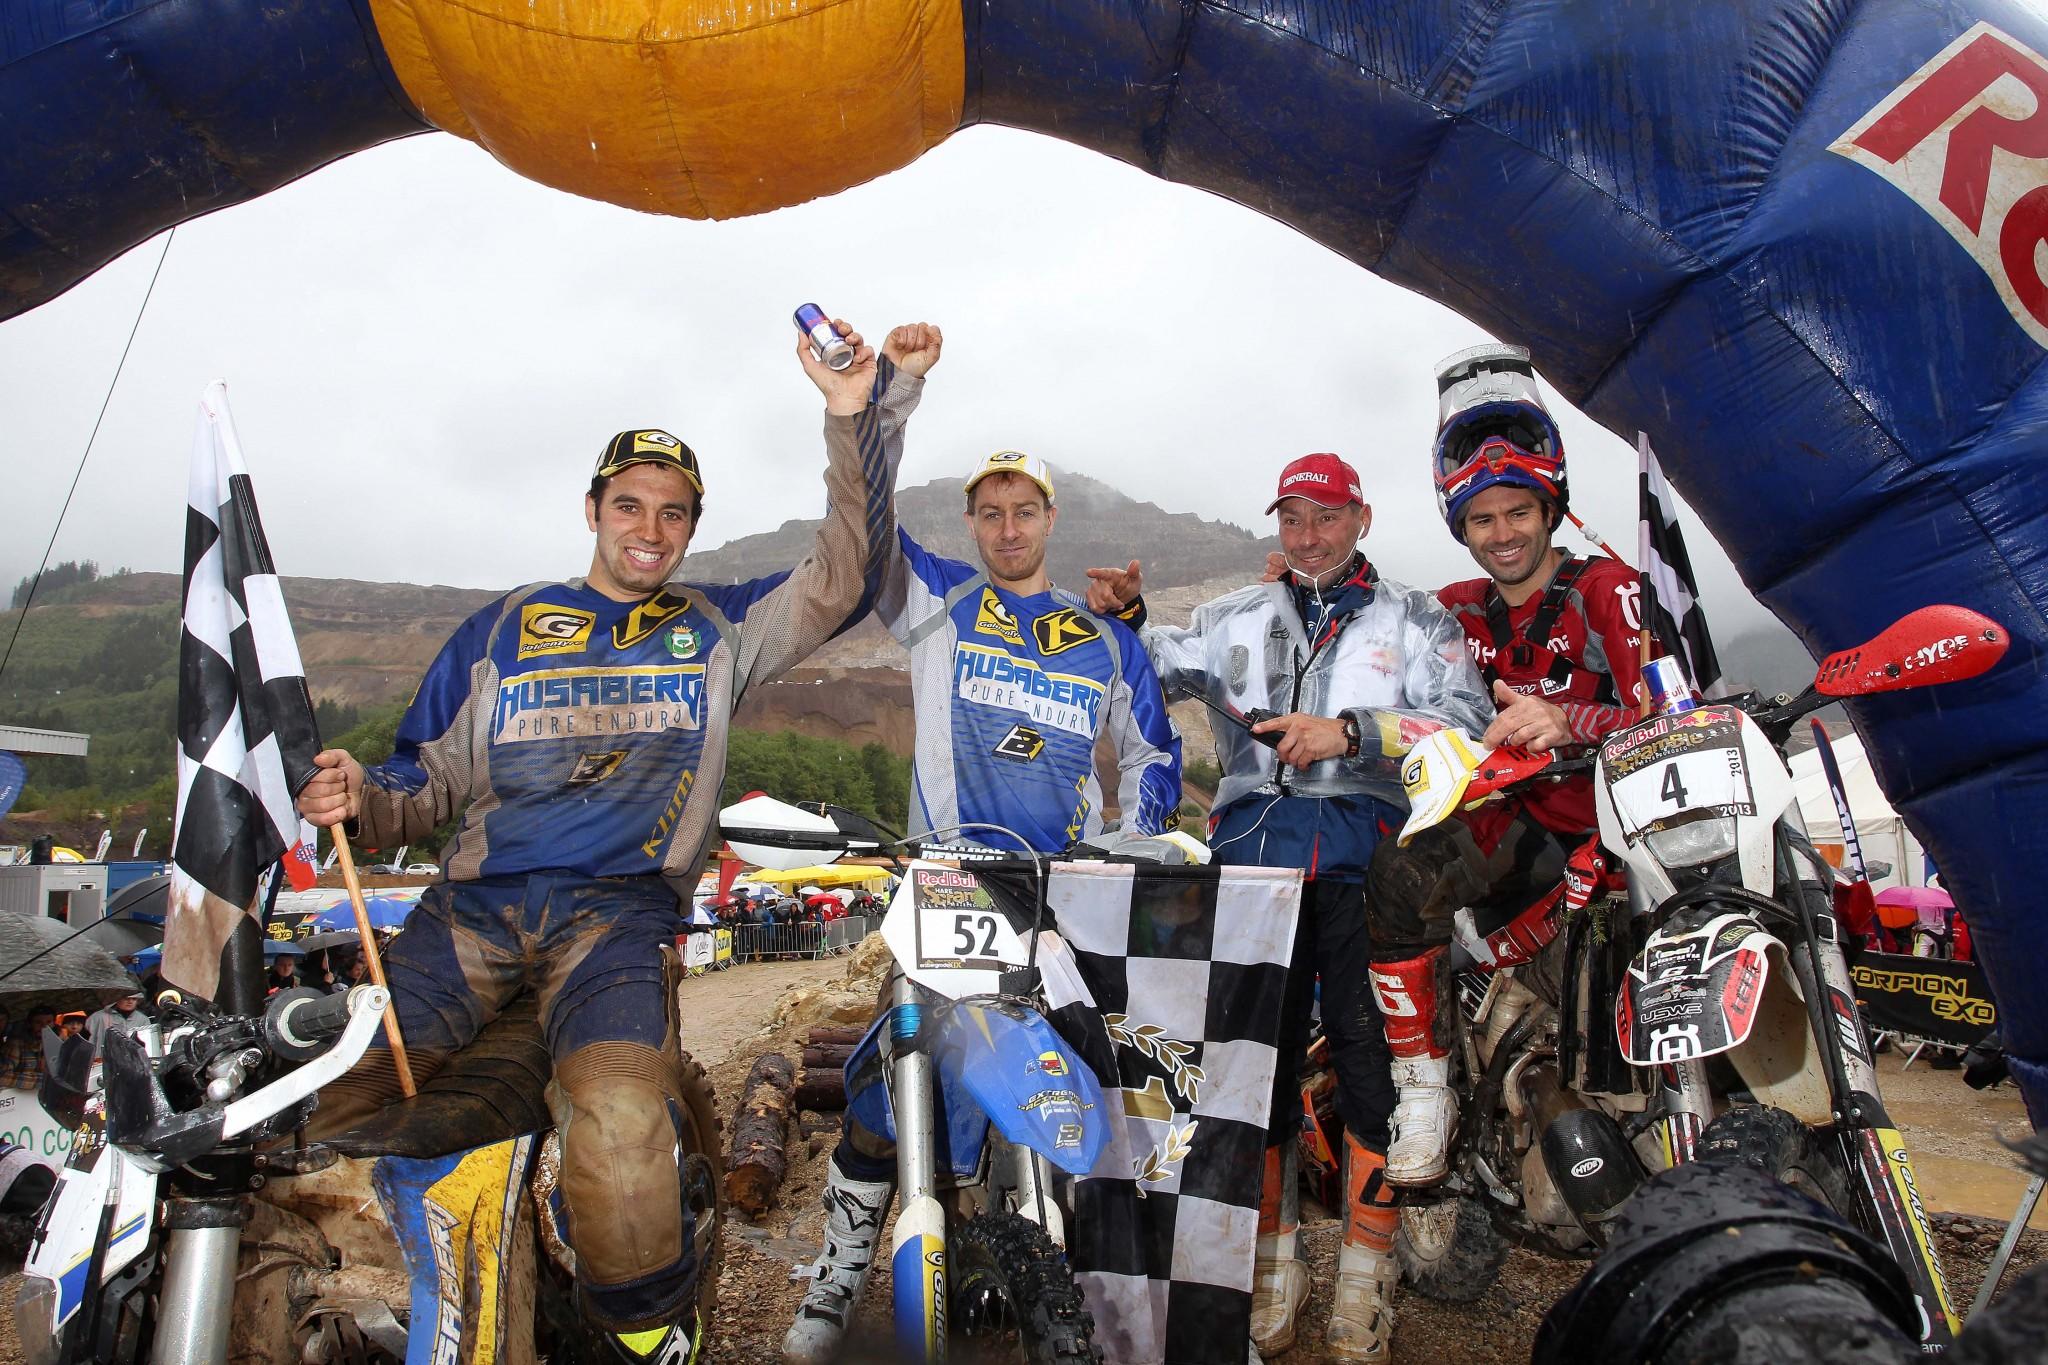 Graham Jarvis, Andreas Lettenbichler y Alfredo Gómez, podio del Erzberg 2013